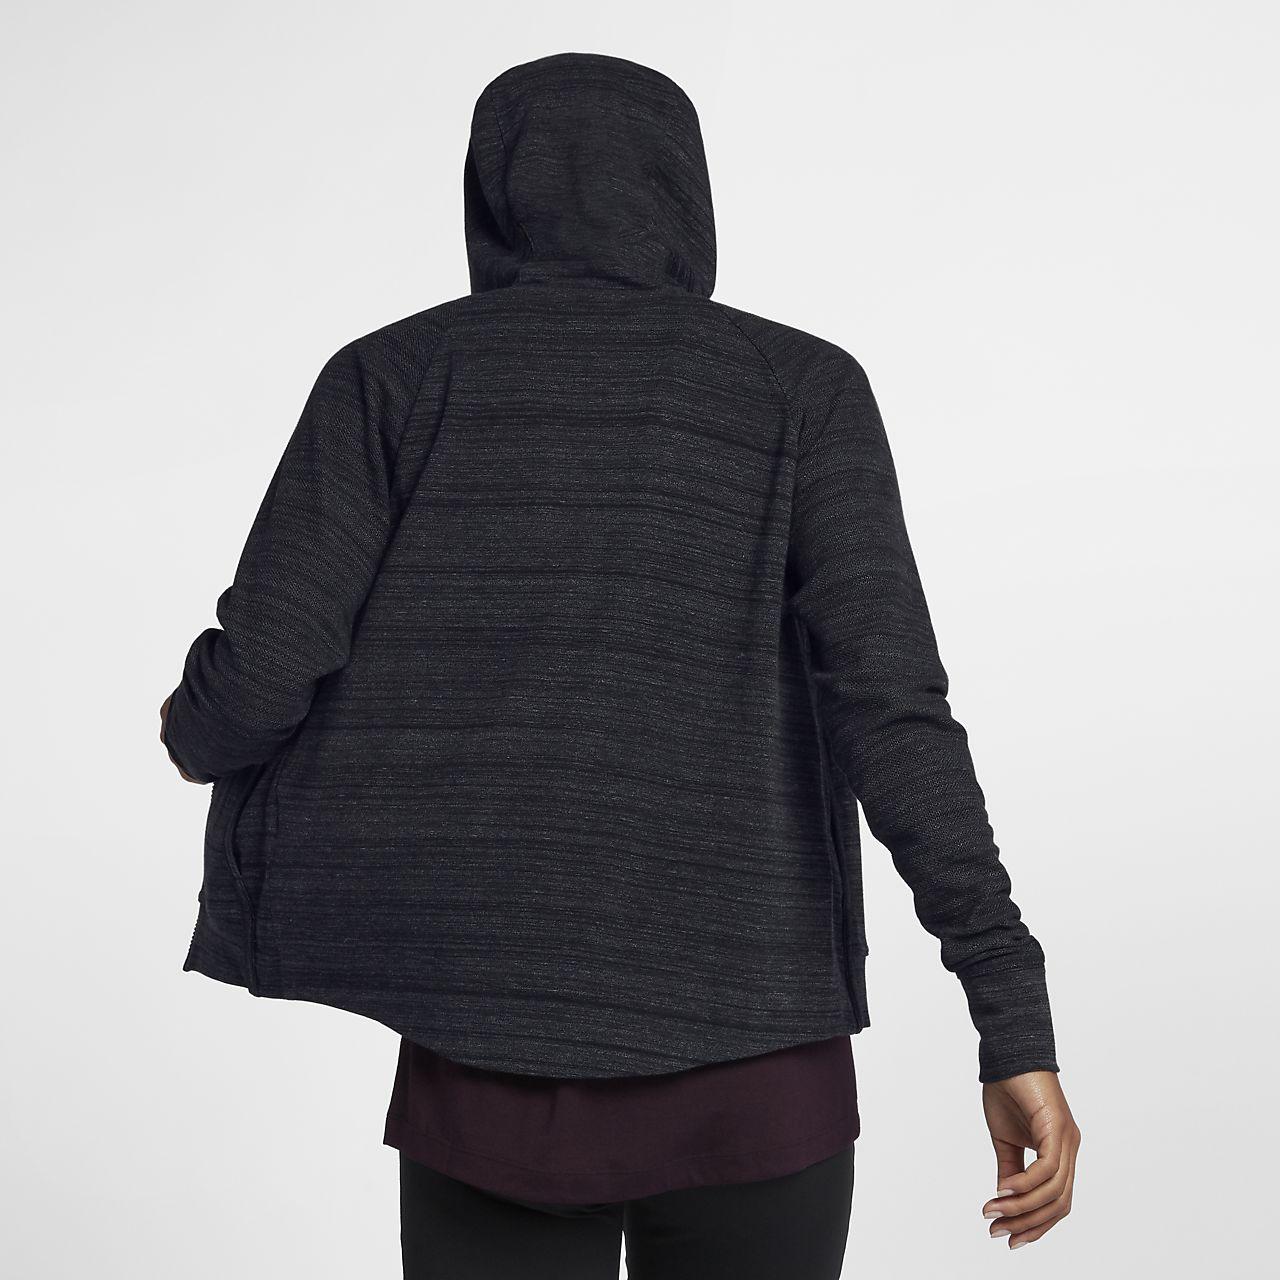 182f010b7bfa9 Nike Sportswear Advance 15 Women s Knit Jacket. Nike.com AU